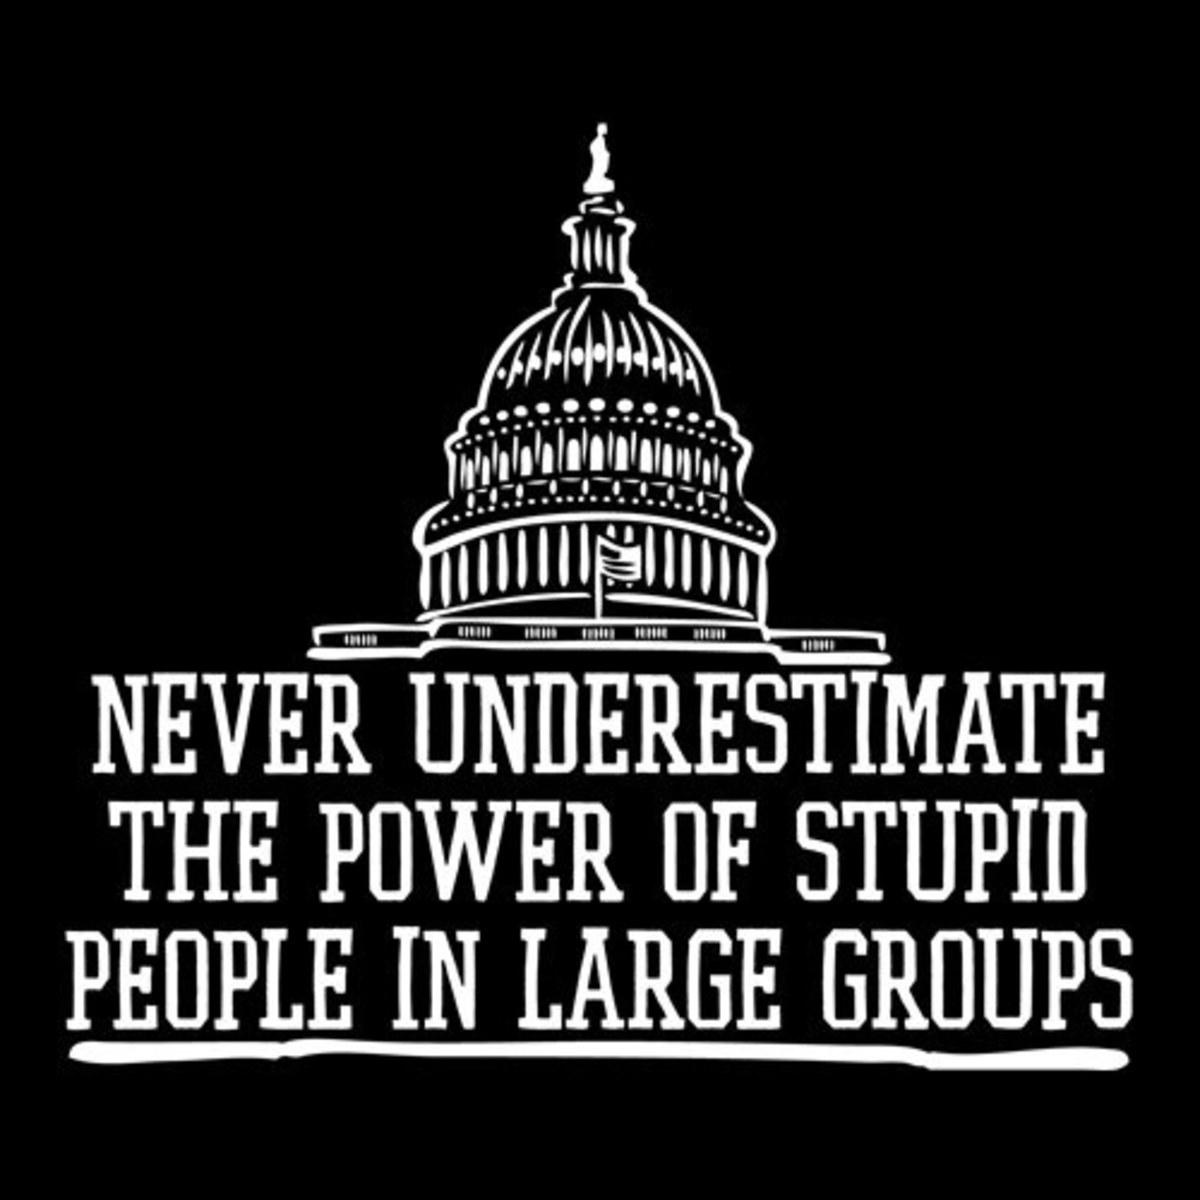 Quotes About Politics - Political Quotes